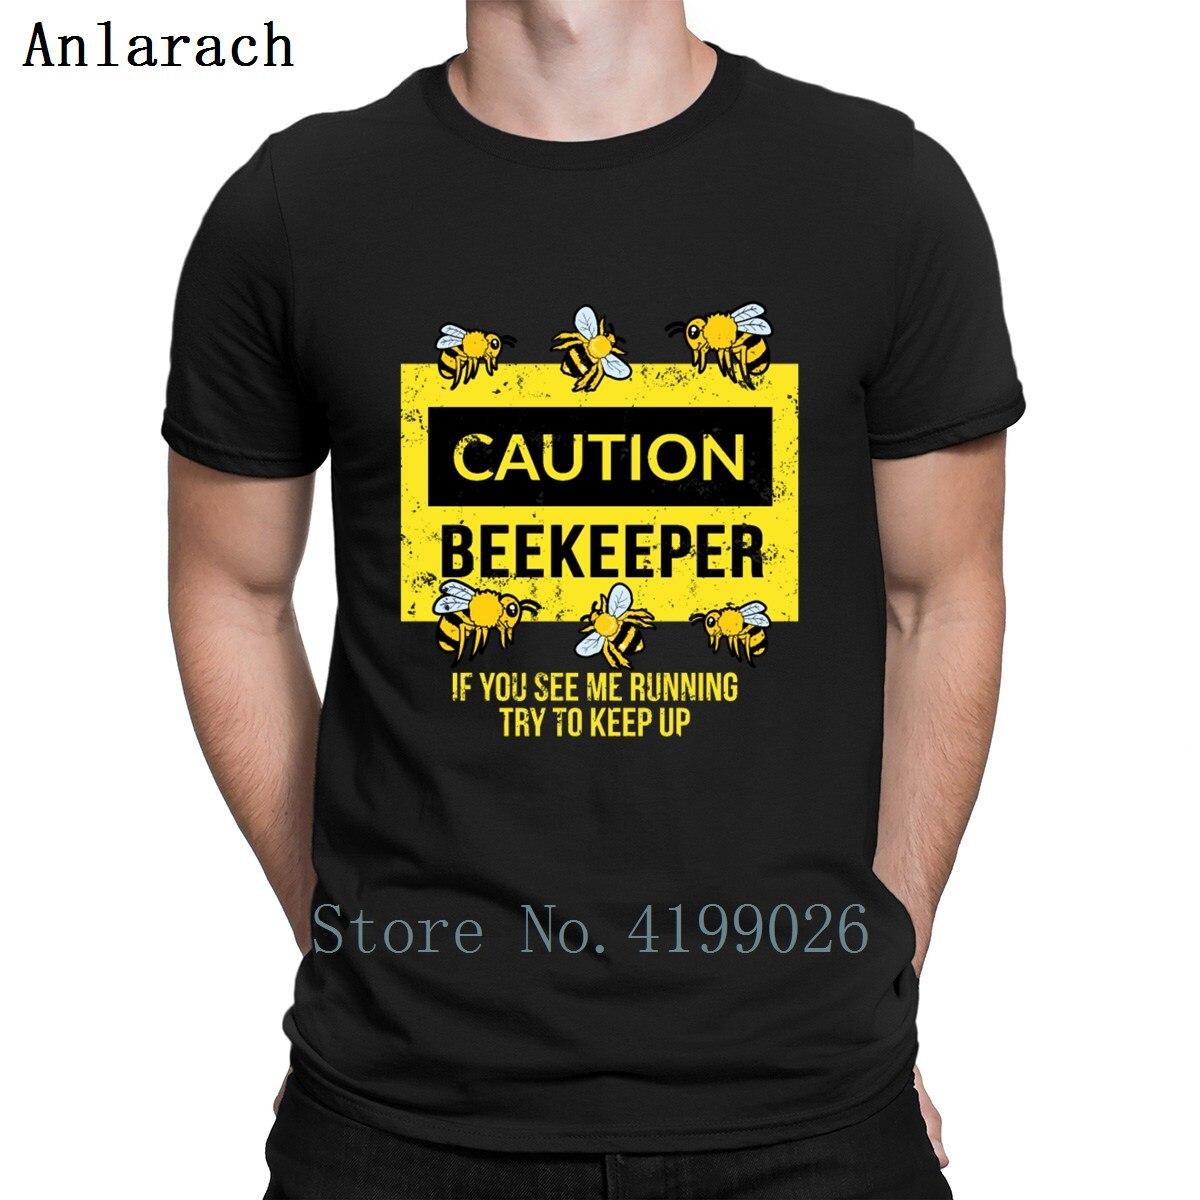 Caution Beekeeper Bee Beekeeping Honey Gift Idea T Shirt O-Neck Stylish Normal Mens T-Shirt Spring 2019 Designer Men Tops Famous